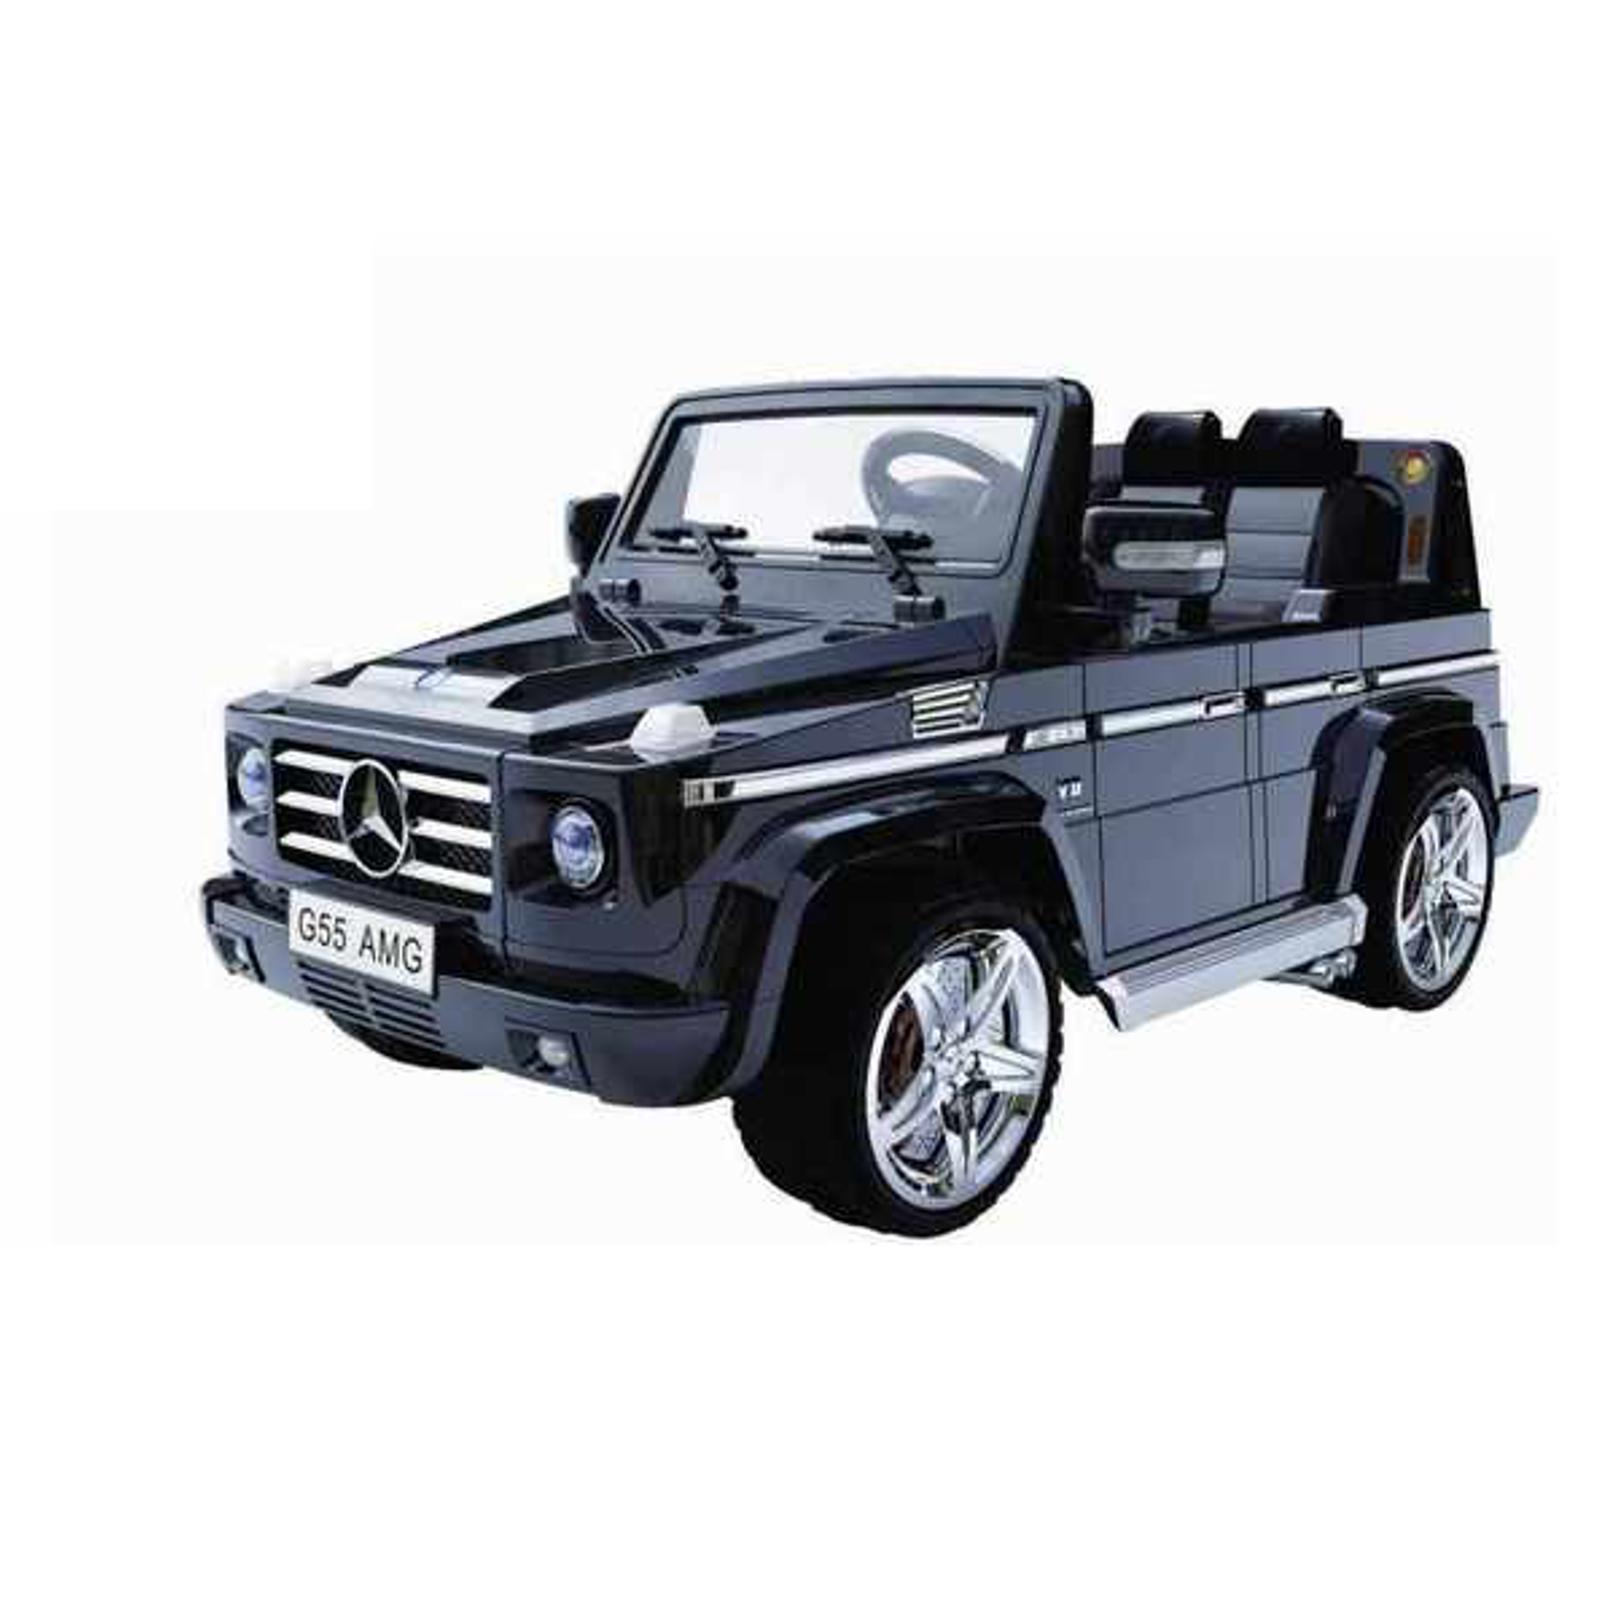 ������������� Joy Automatic Mersedes Benz G55 AMG � ������� ������ ��������